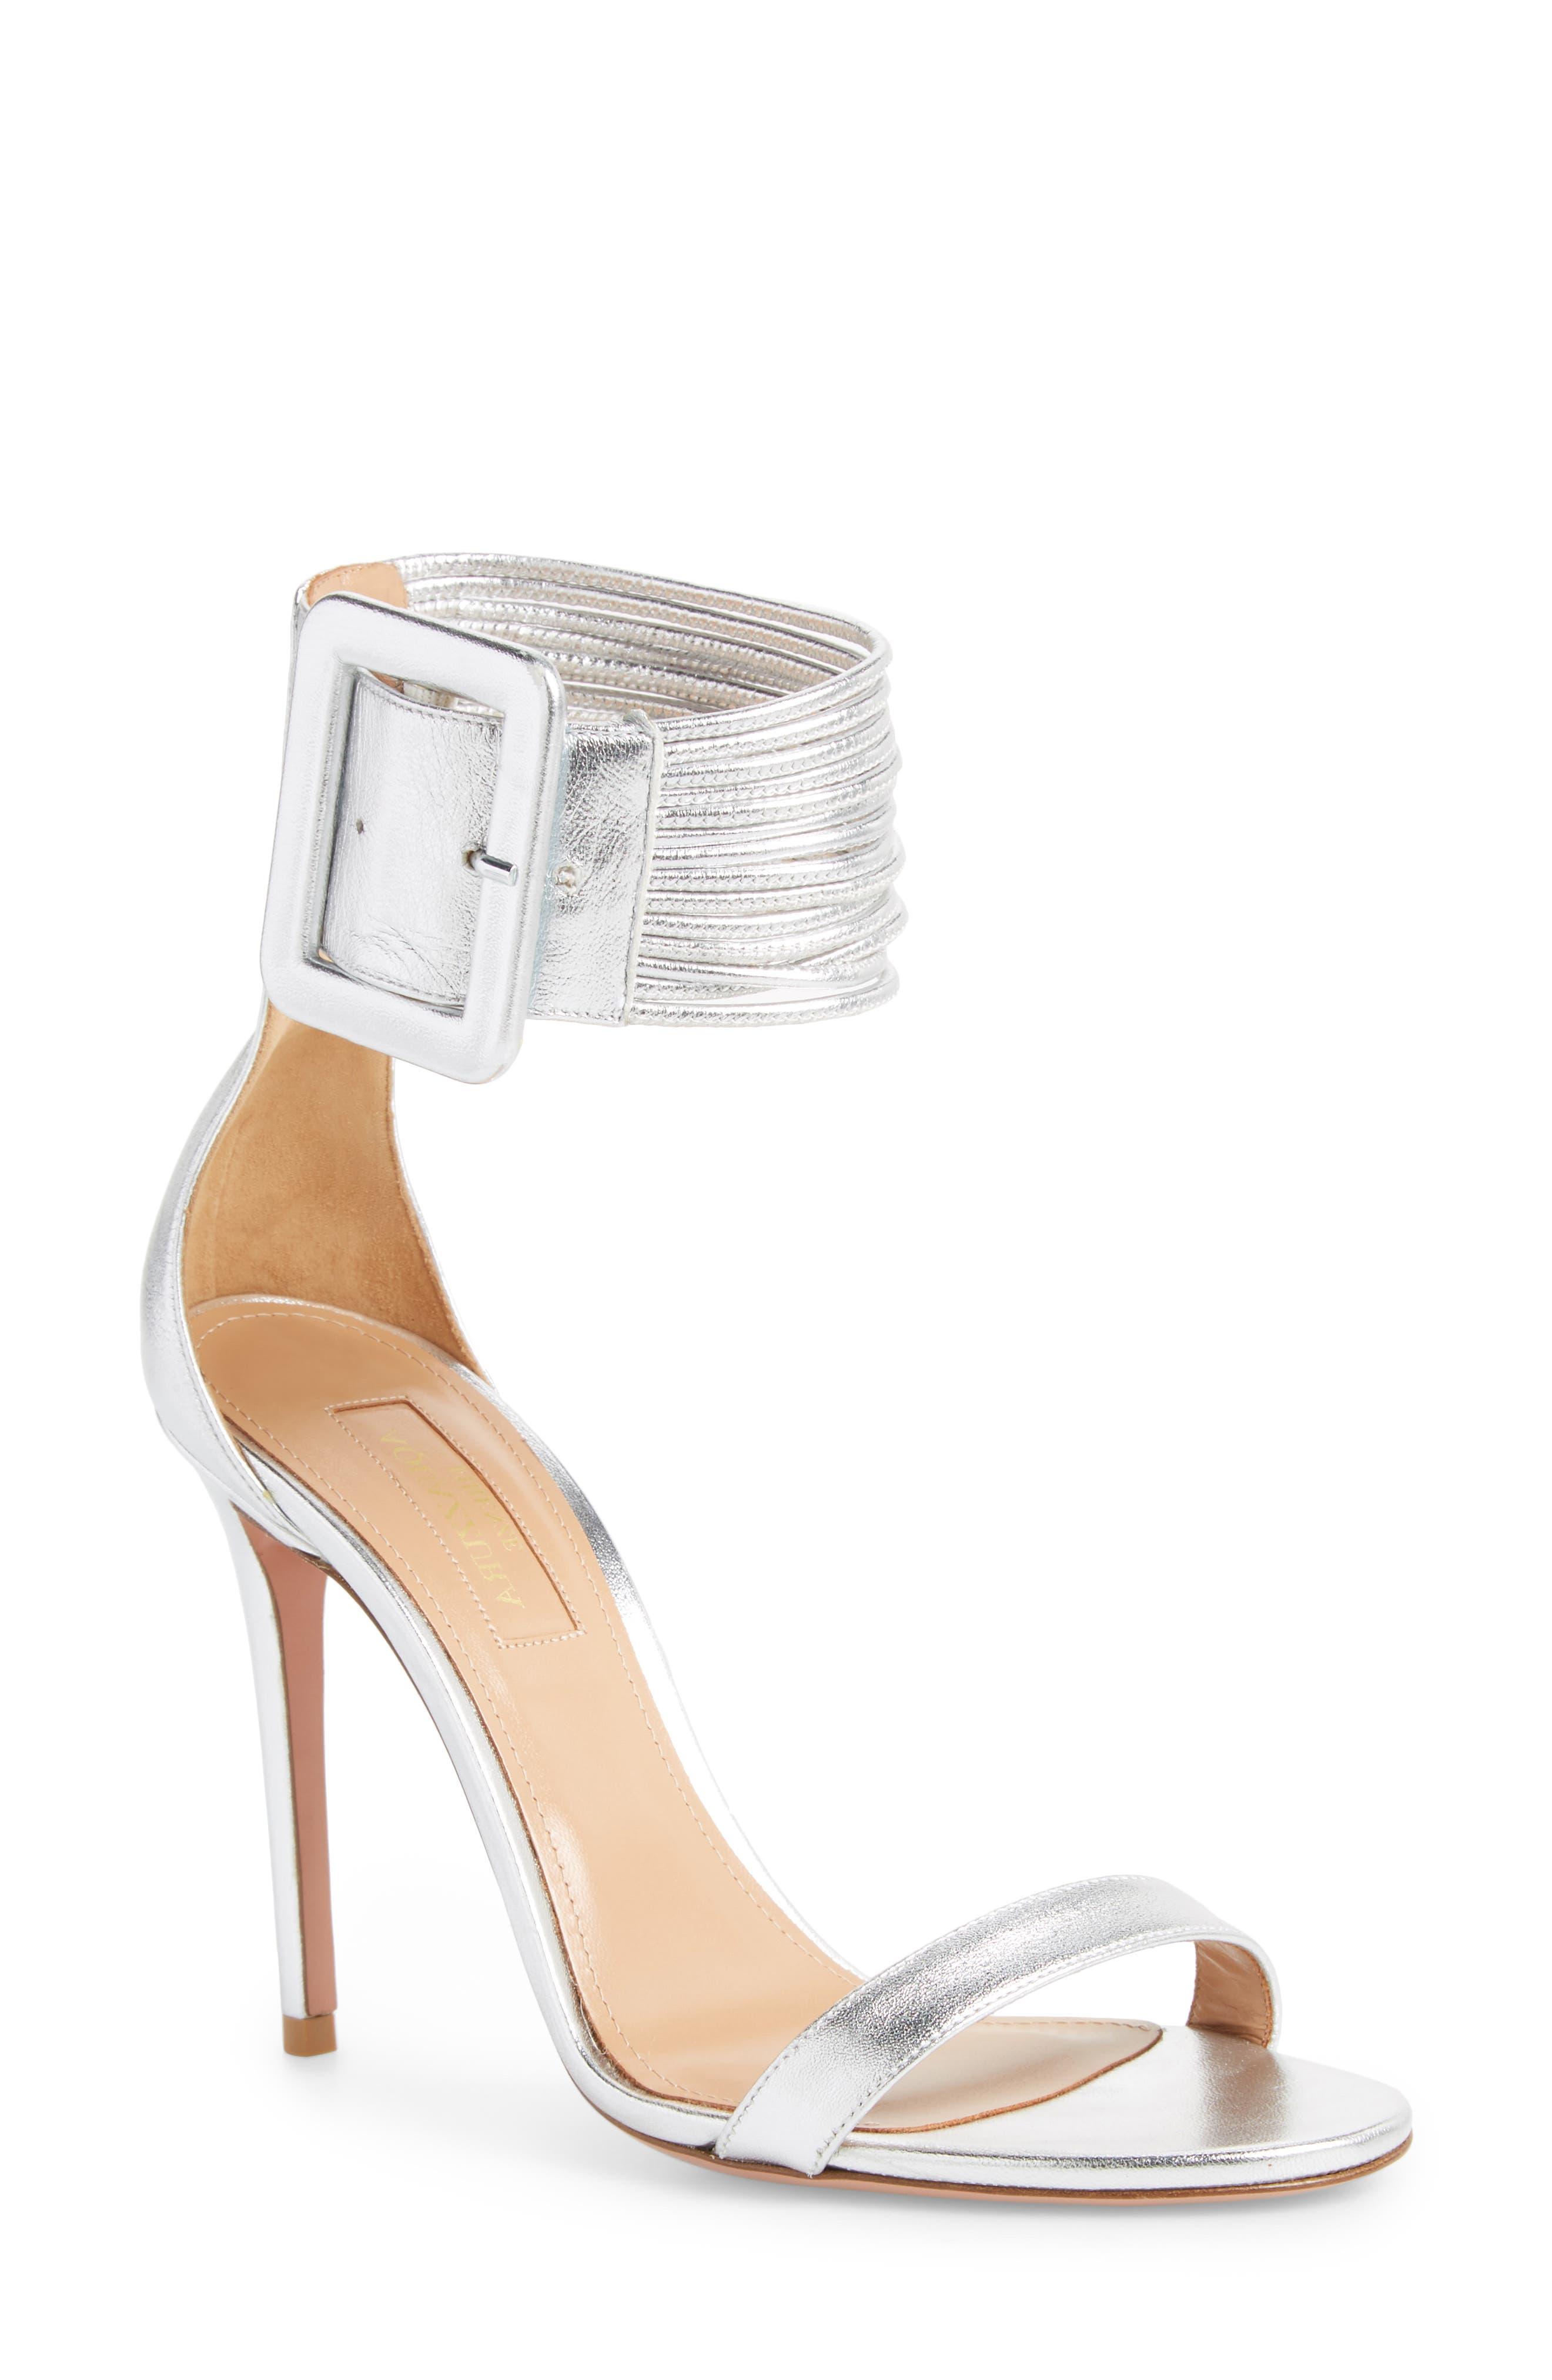 Main Image - Aquazzura Casablanca Ankle Cuff Sandal (Women)